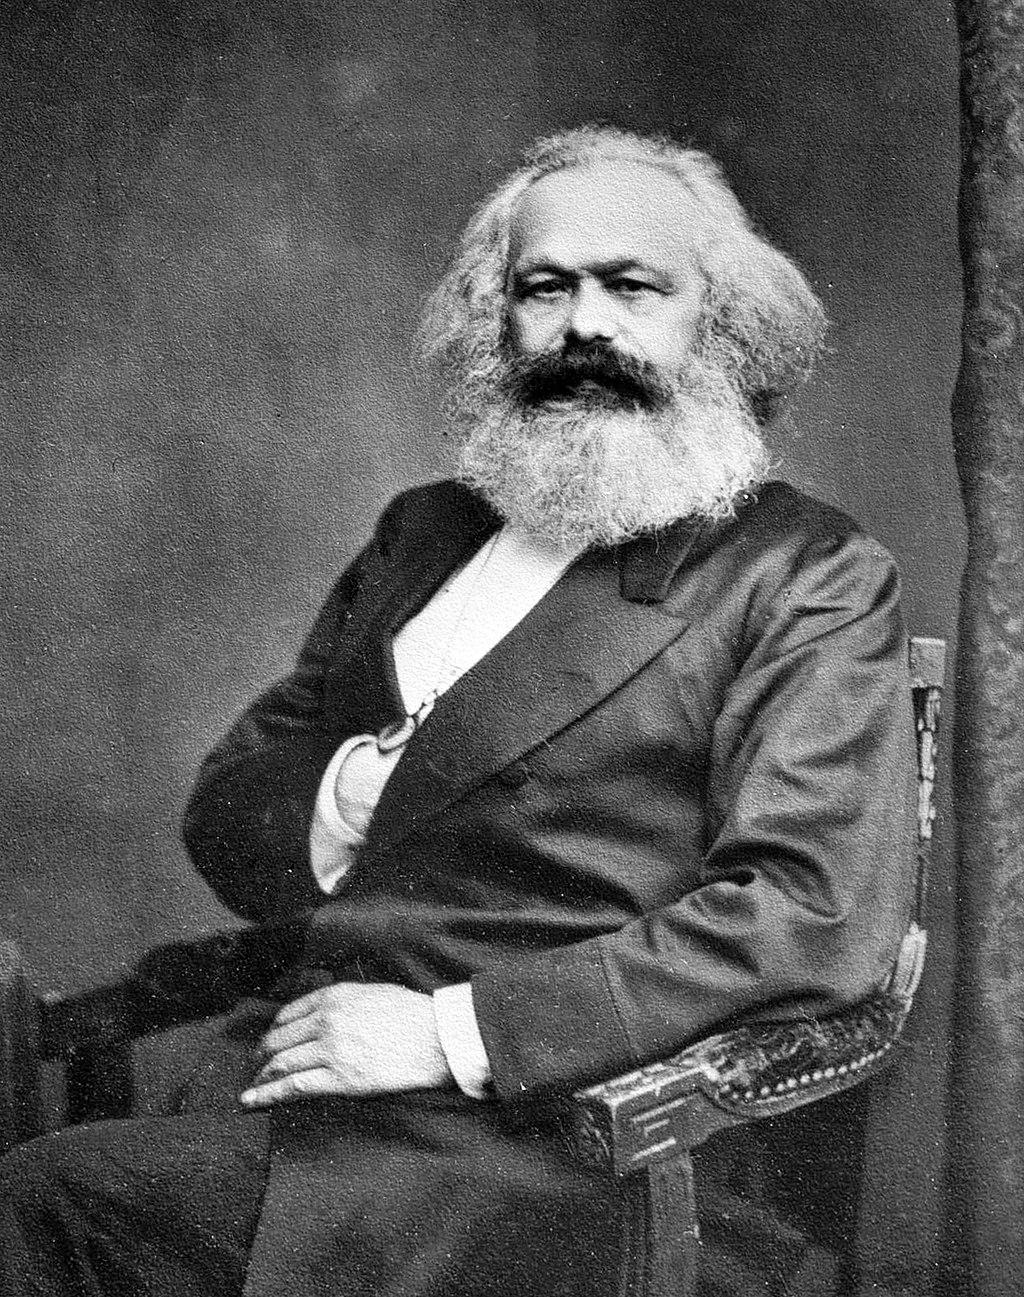 1024px-Karl_Marx_001.jpg